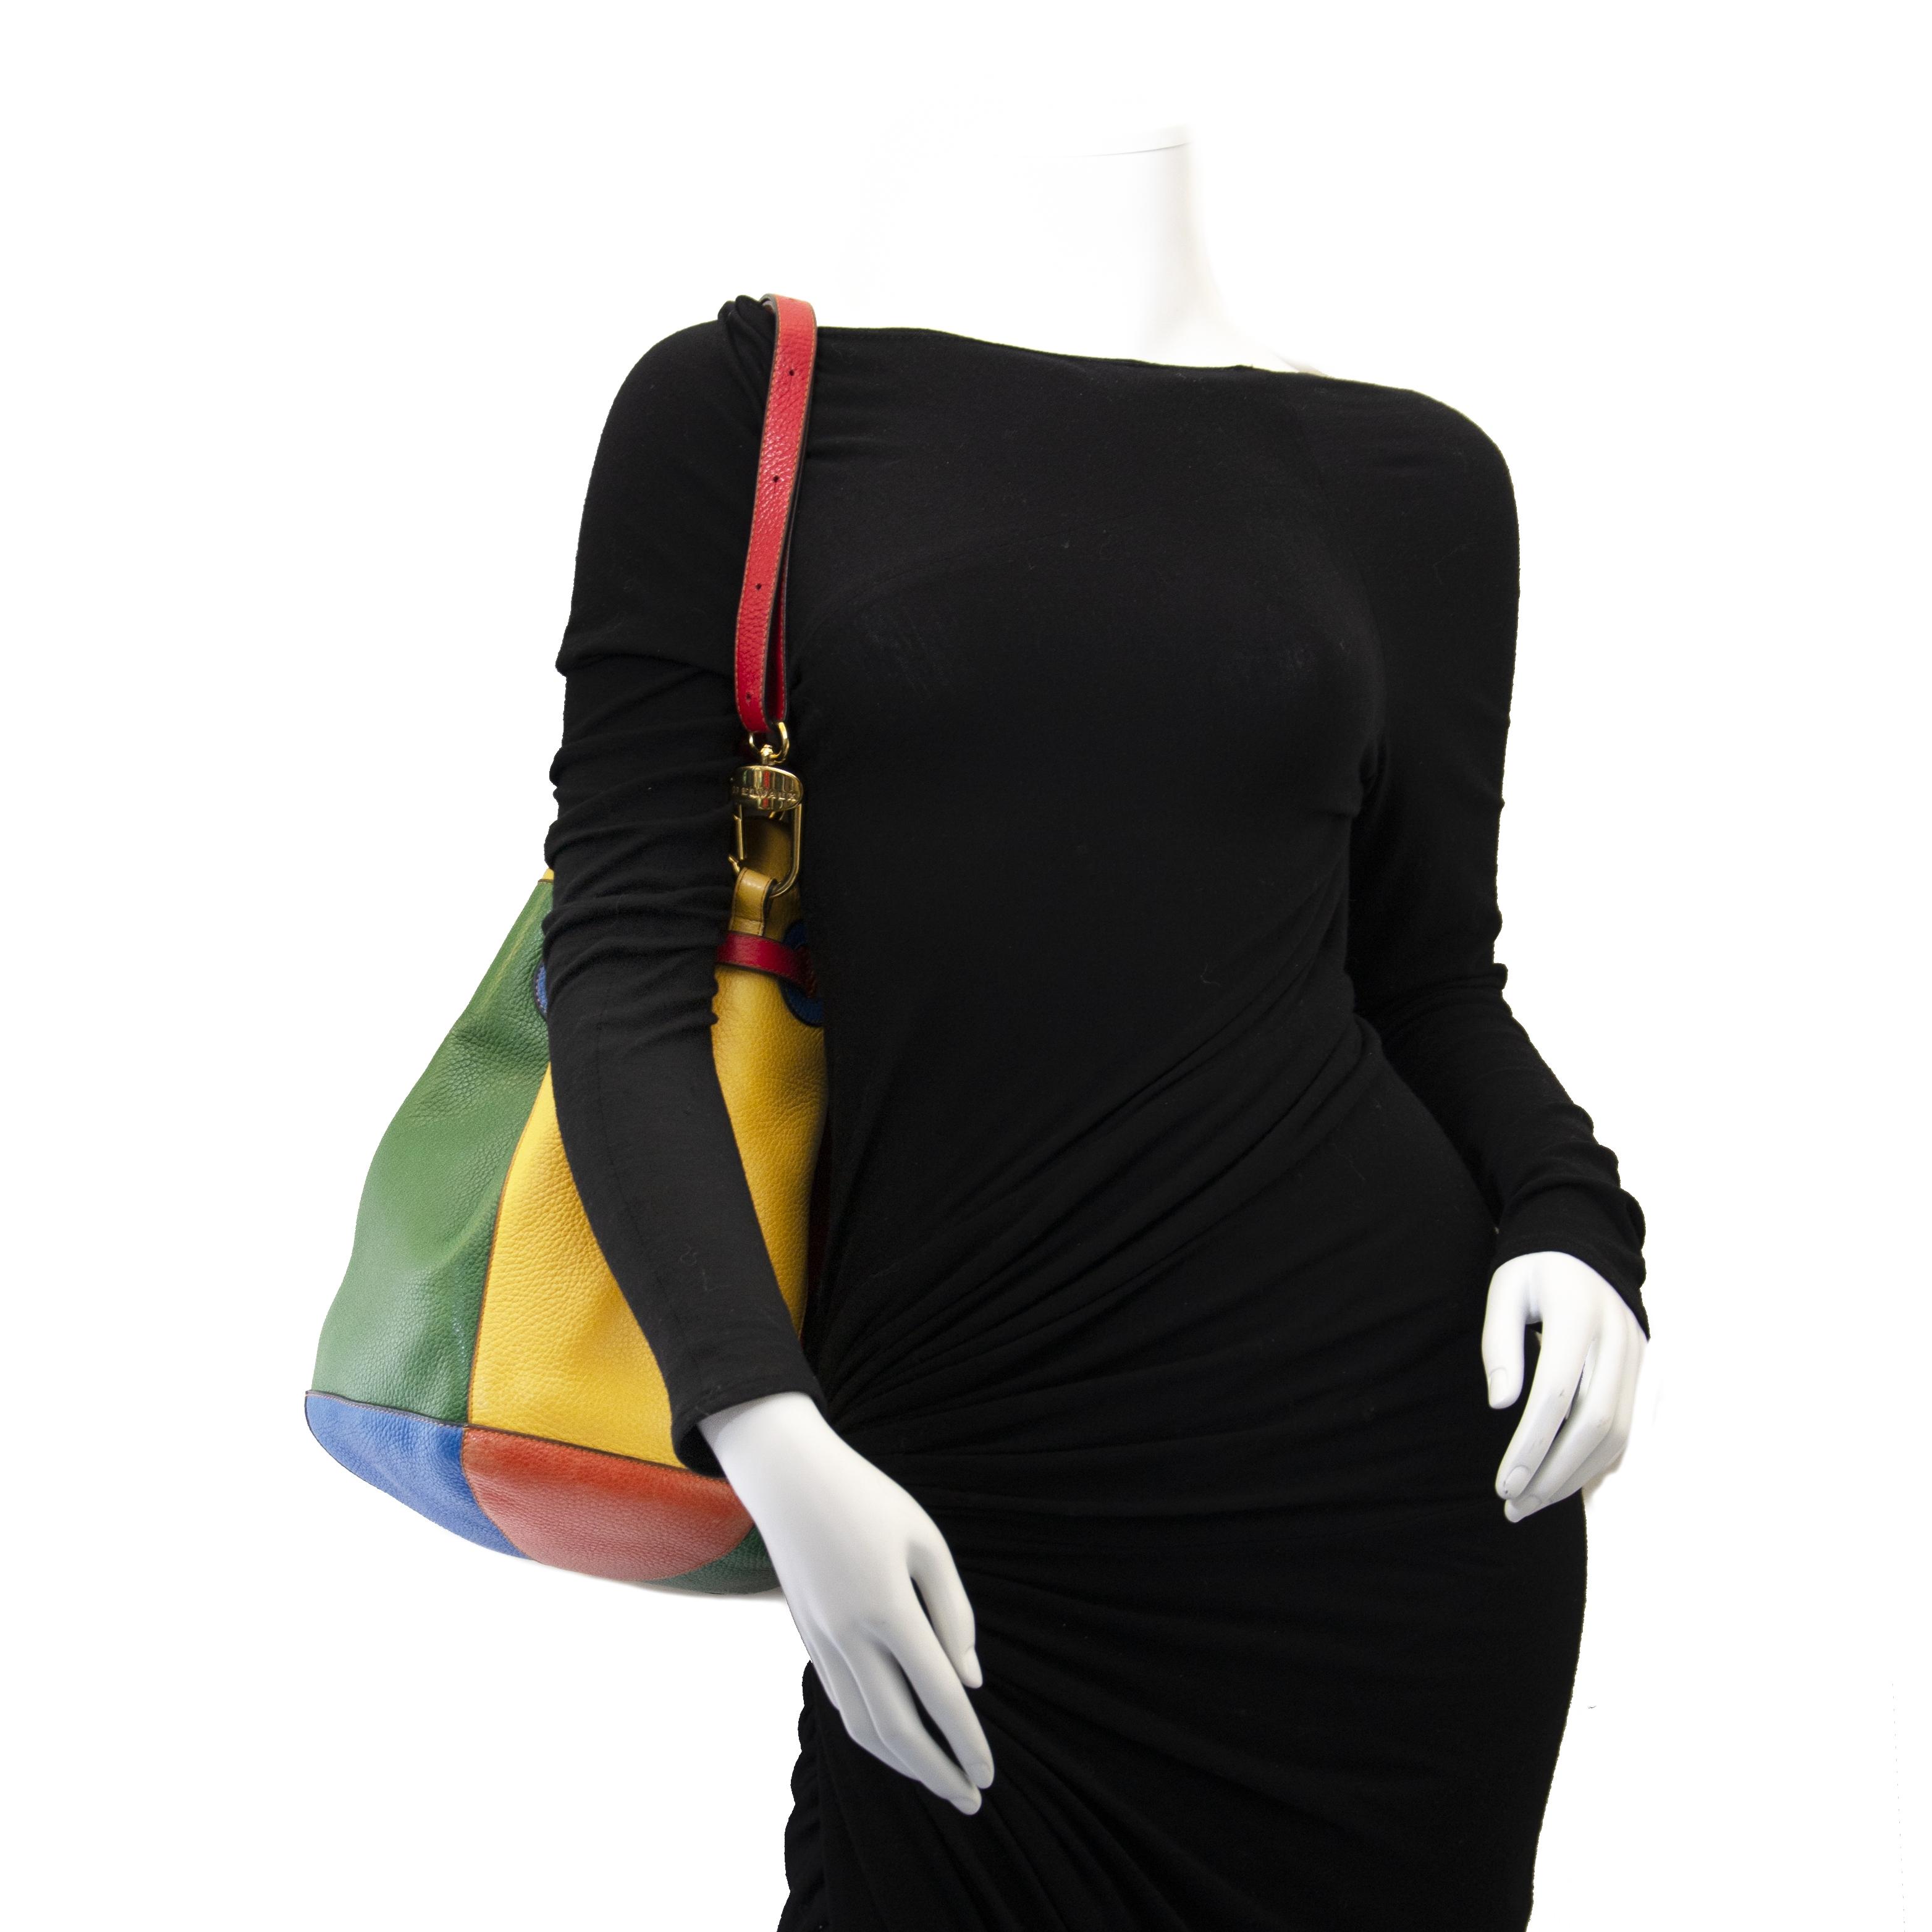 Delvaux Multicolor Nomade Bucket Bag  onlien for the best price